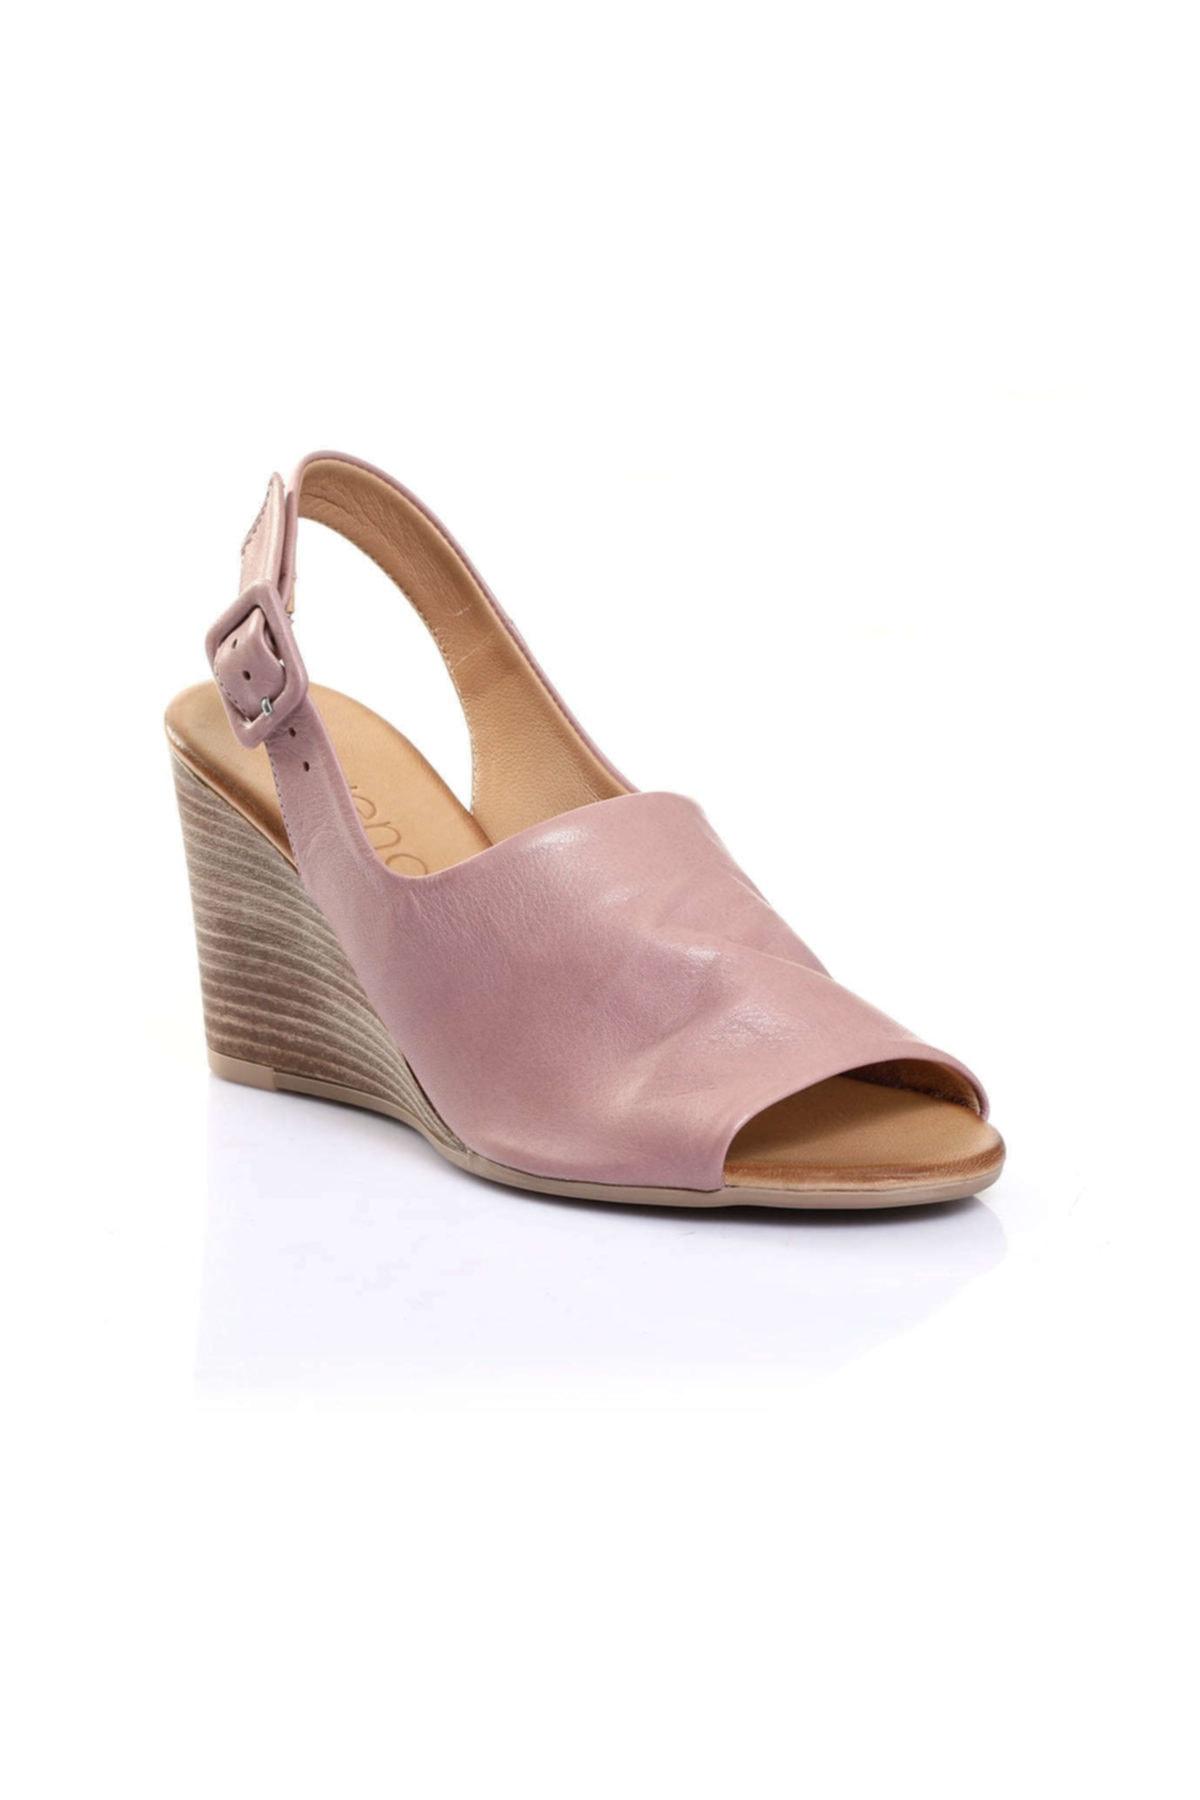 BUENO Shoes Bej Bayan Sandalet 9n1407 1